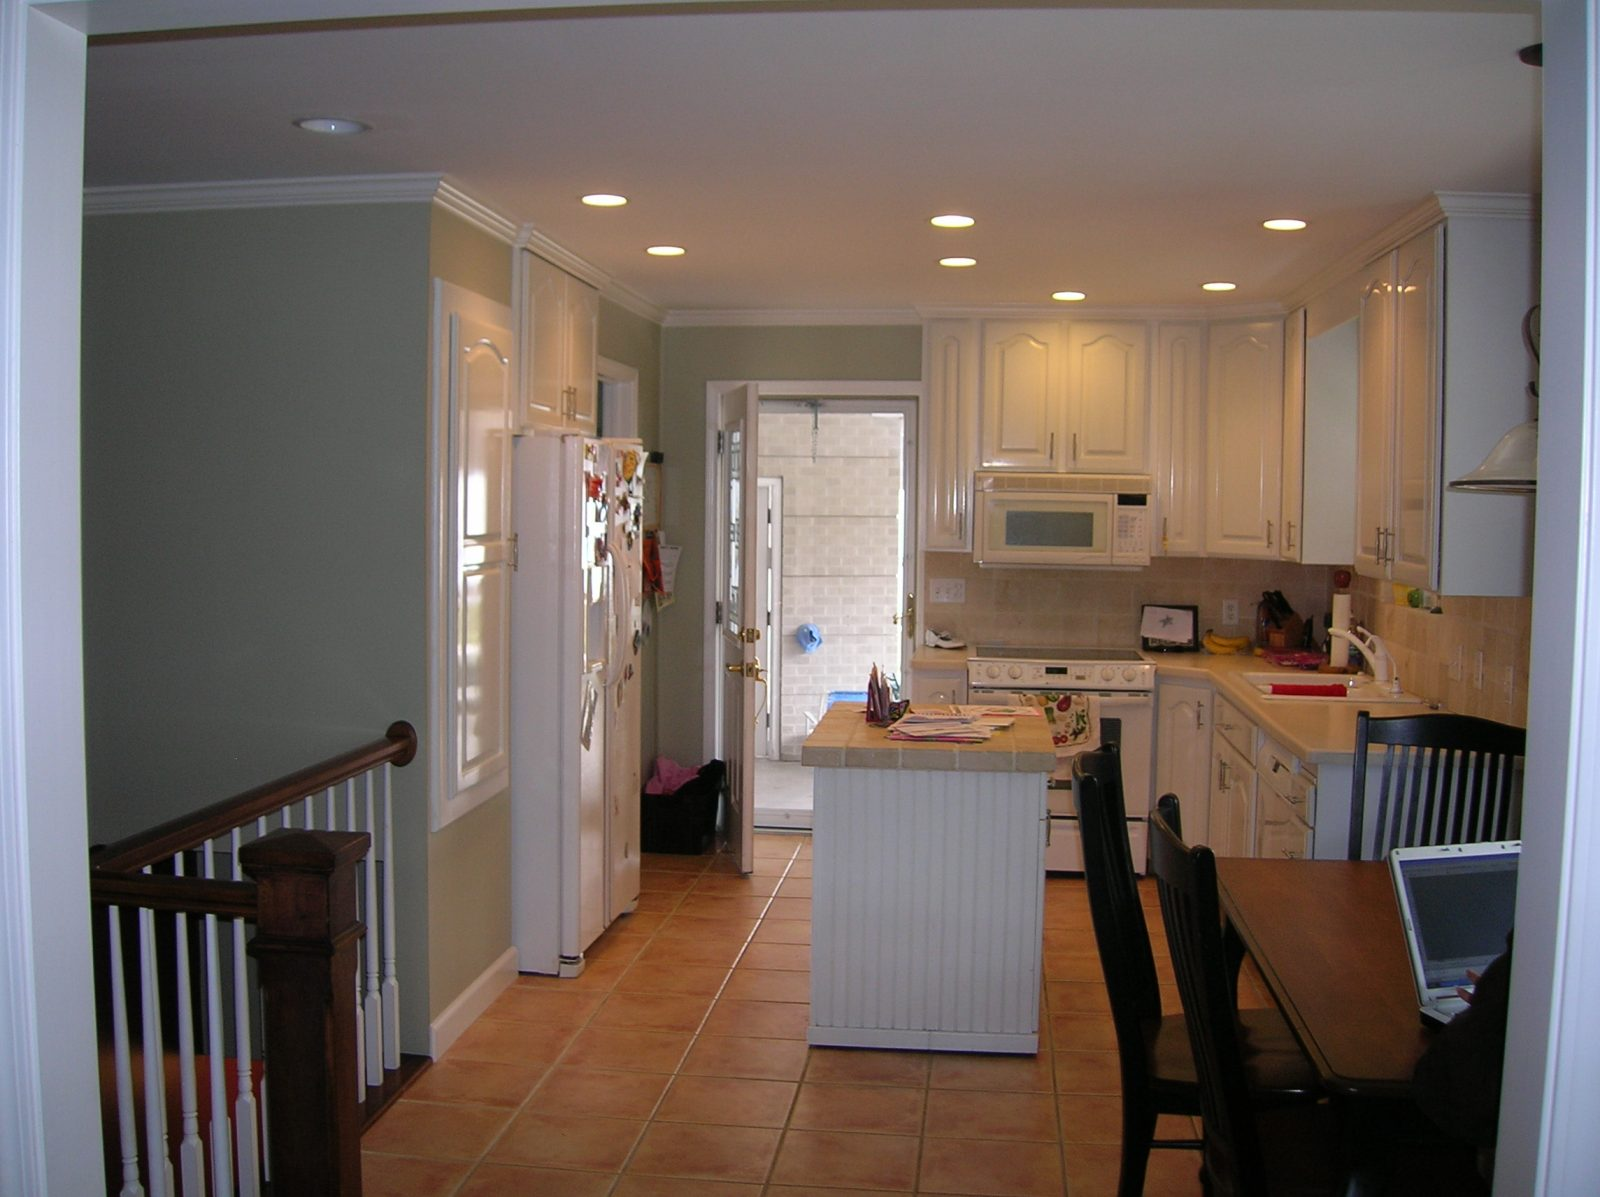 _Before_Interior_Kitchen_Rambler Kitchens | Renovation Design Group